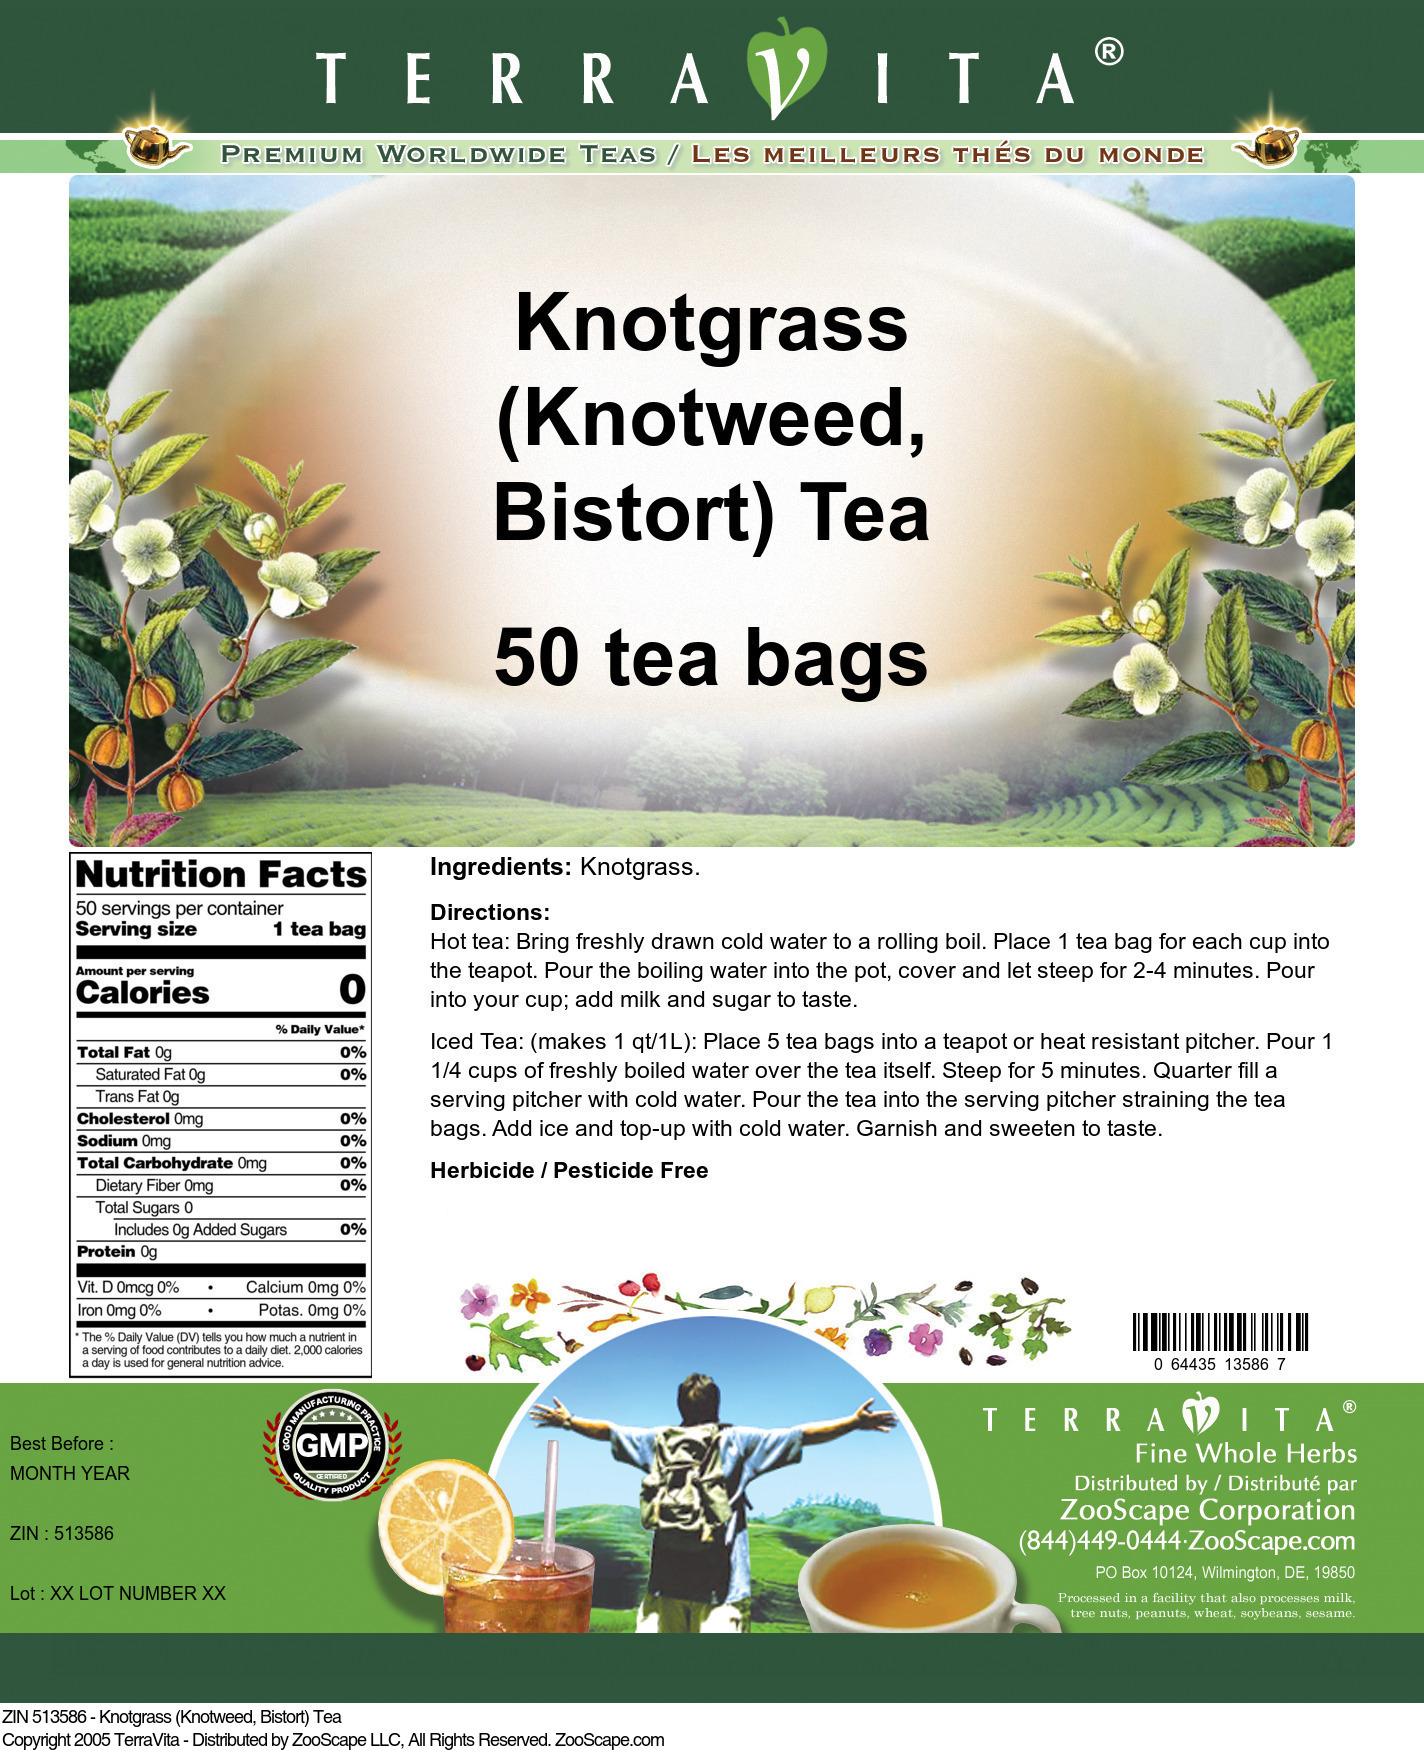 Knotgrass